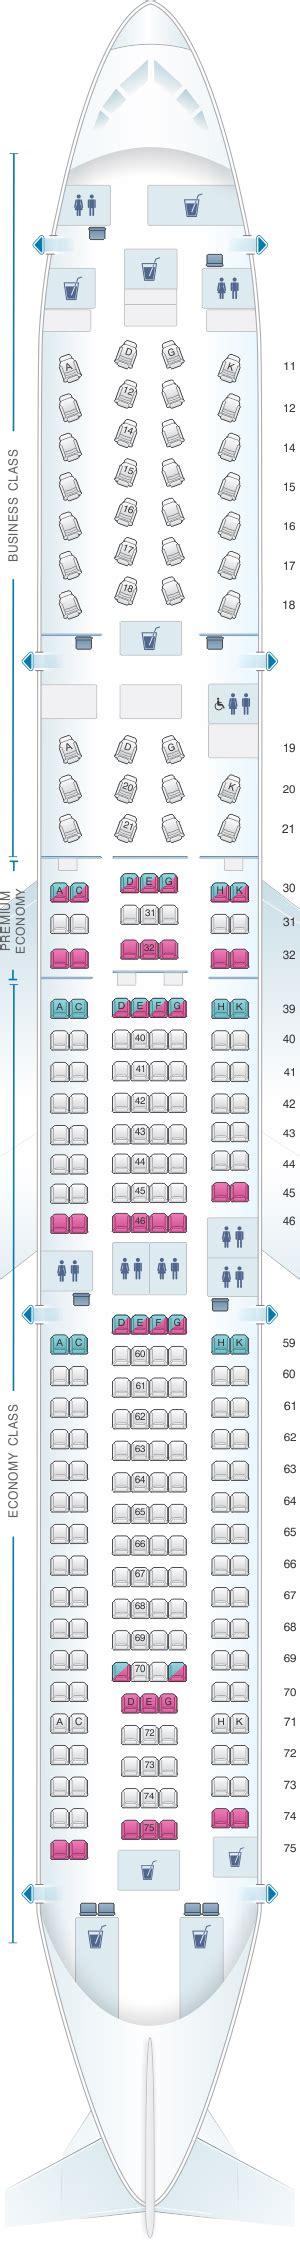 a330 seat map cathay pacific seat map cathay pacific airways airbus a330 300 33k